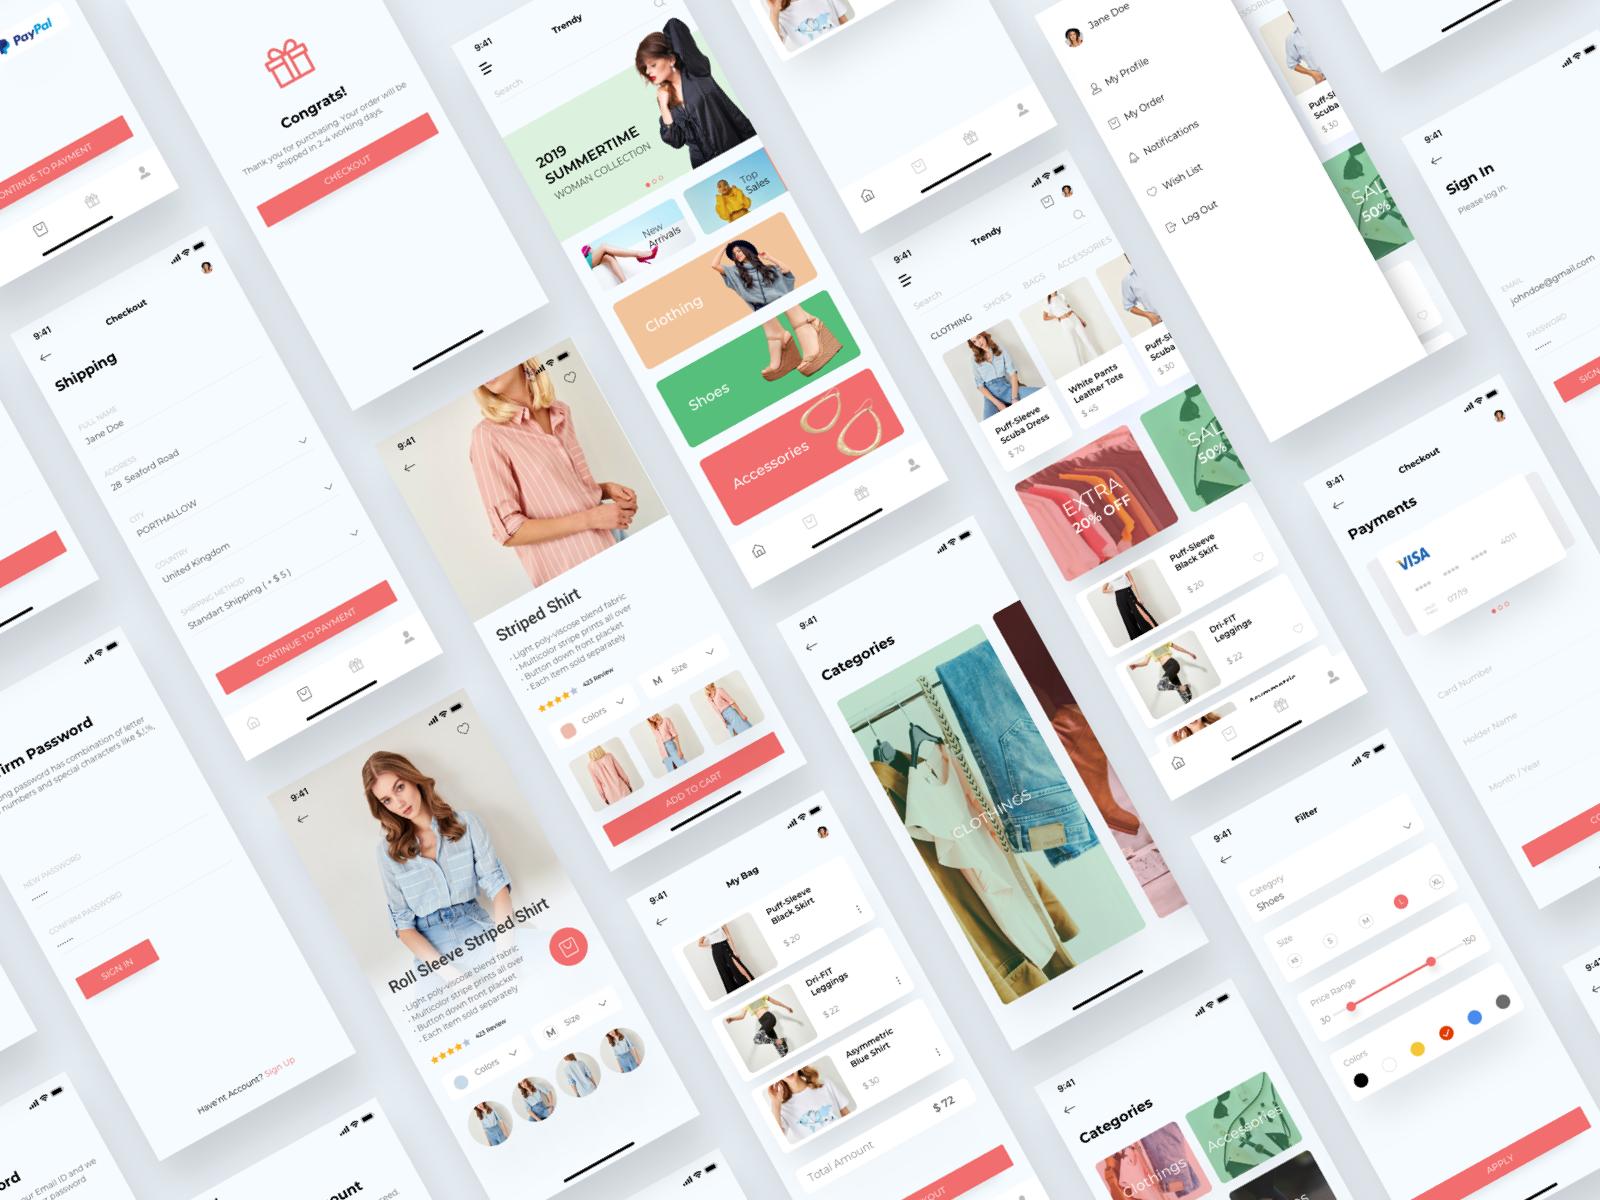 时尚购物电子商务UI / UX套件Trendy Shopping eCommerce UI/UX KIT